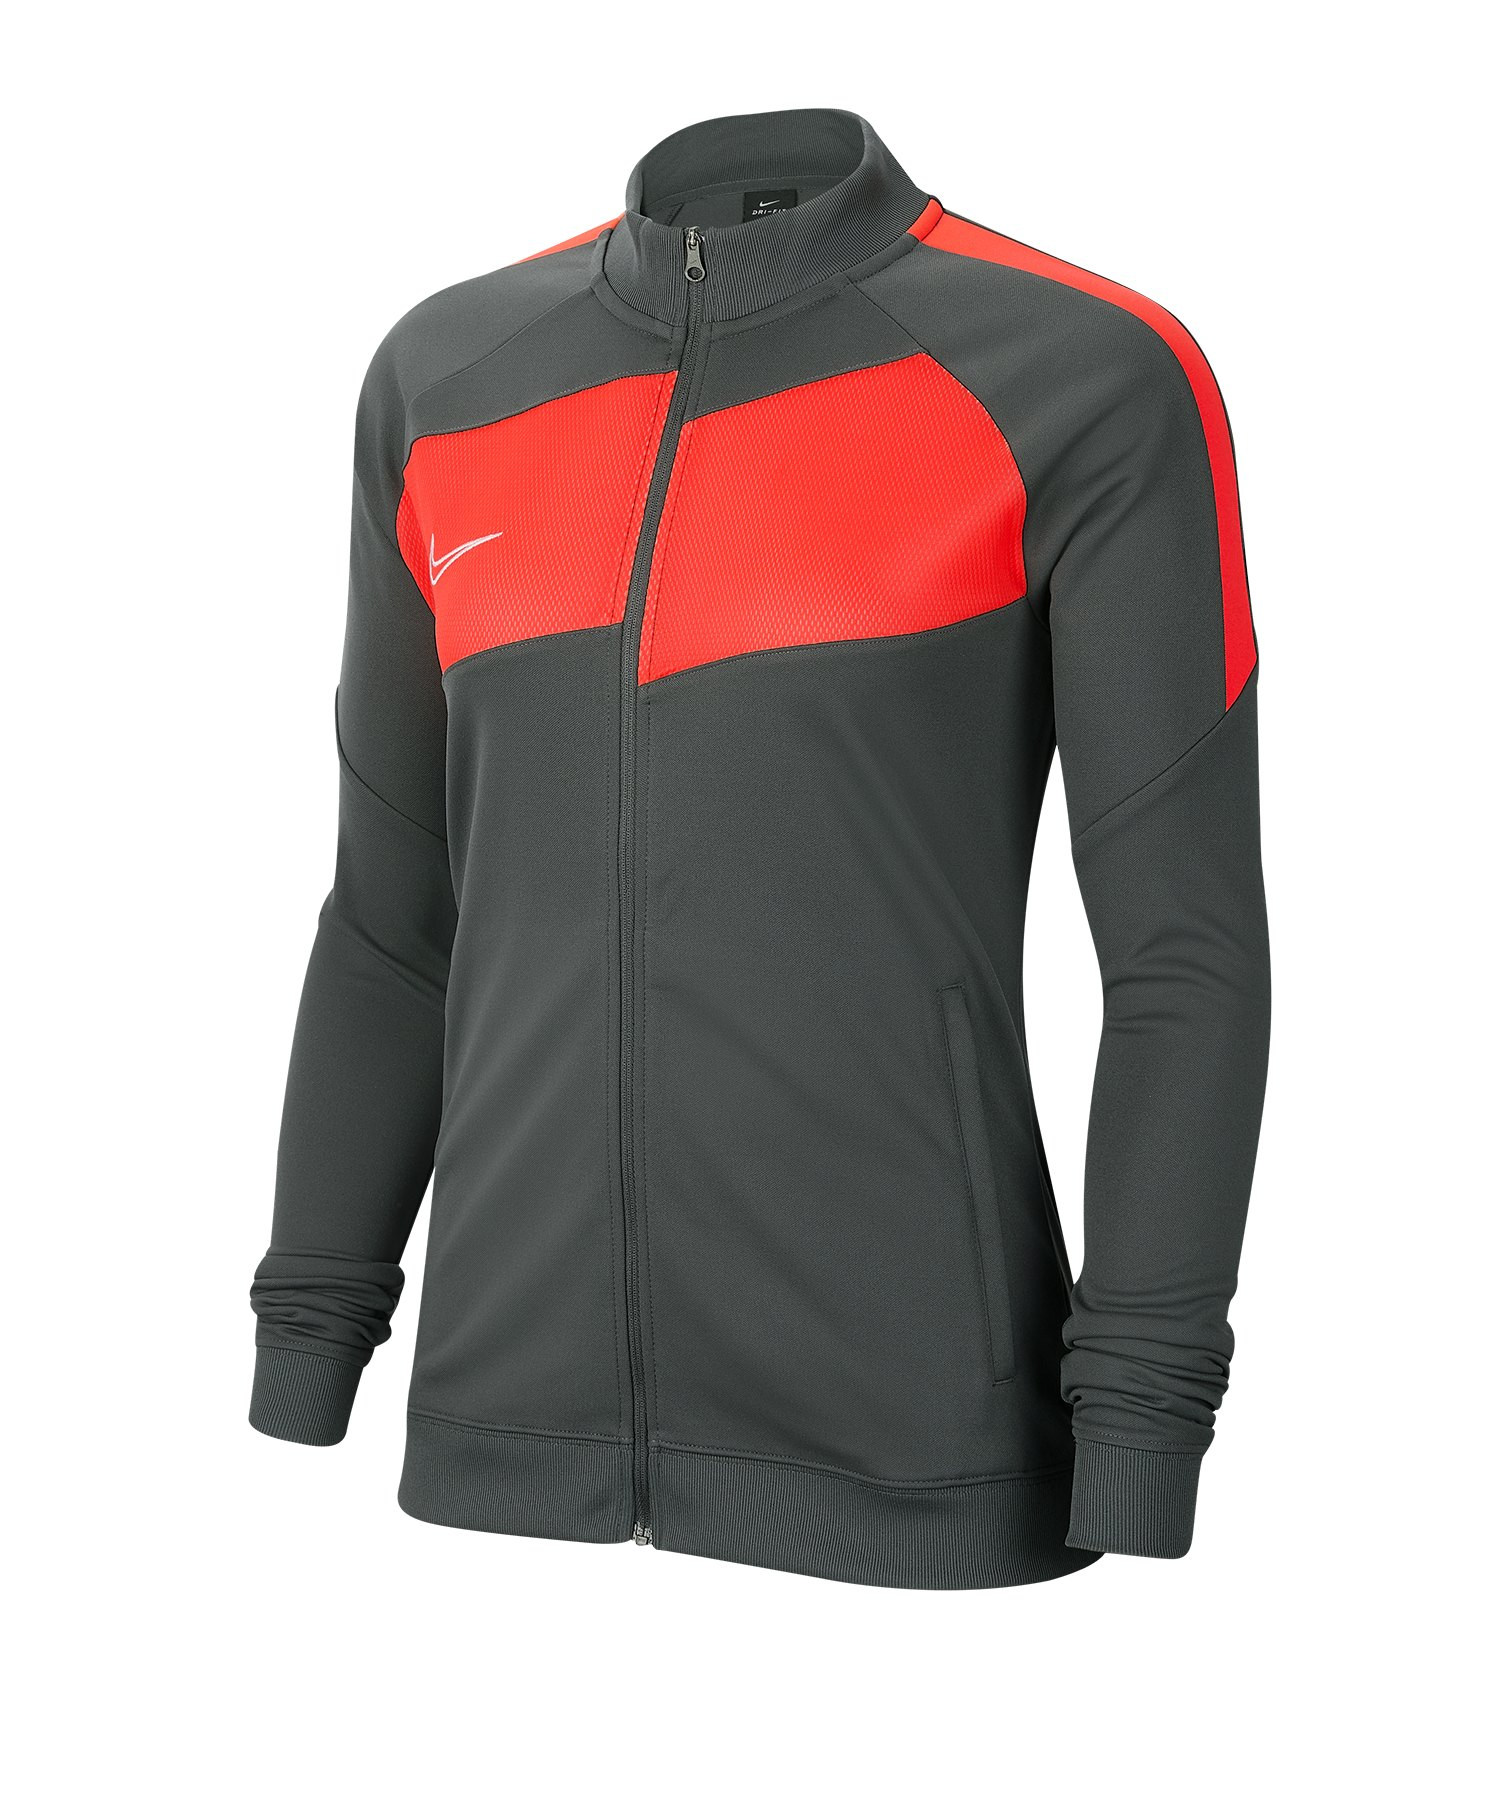 Nike Academy Pro Jacke Damen Grau Rot F068 - grau